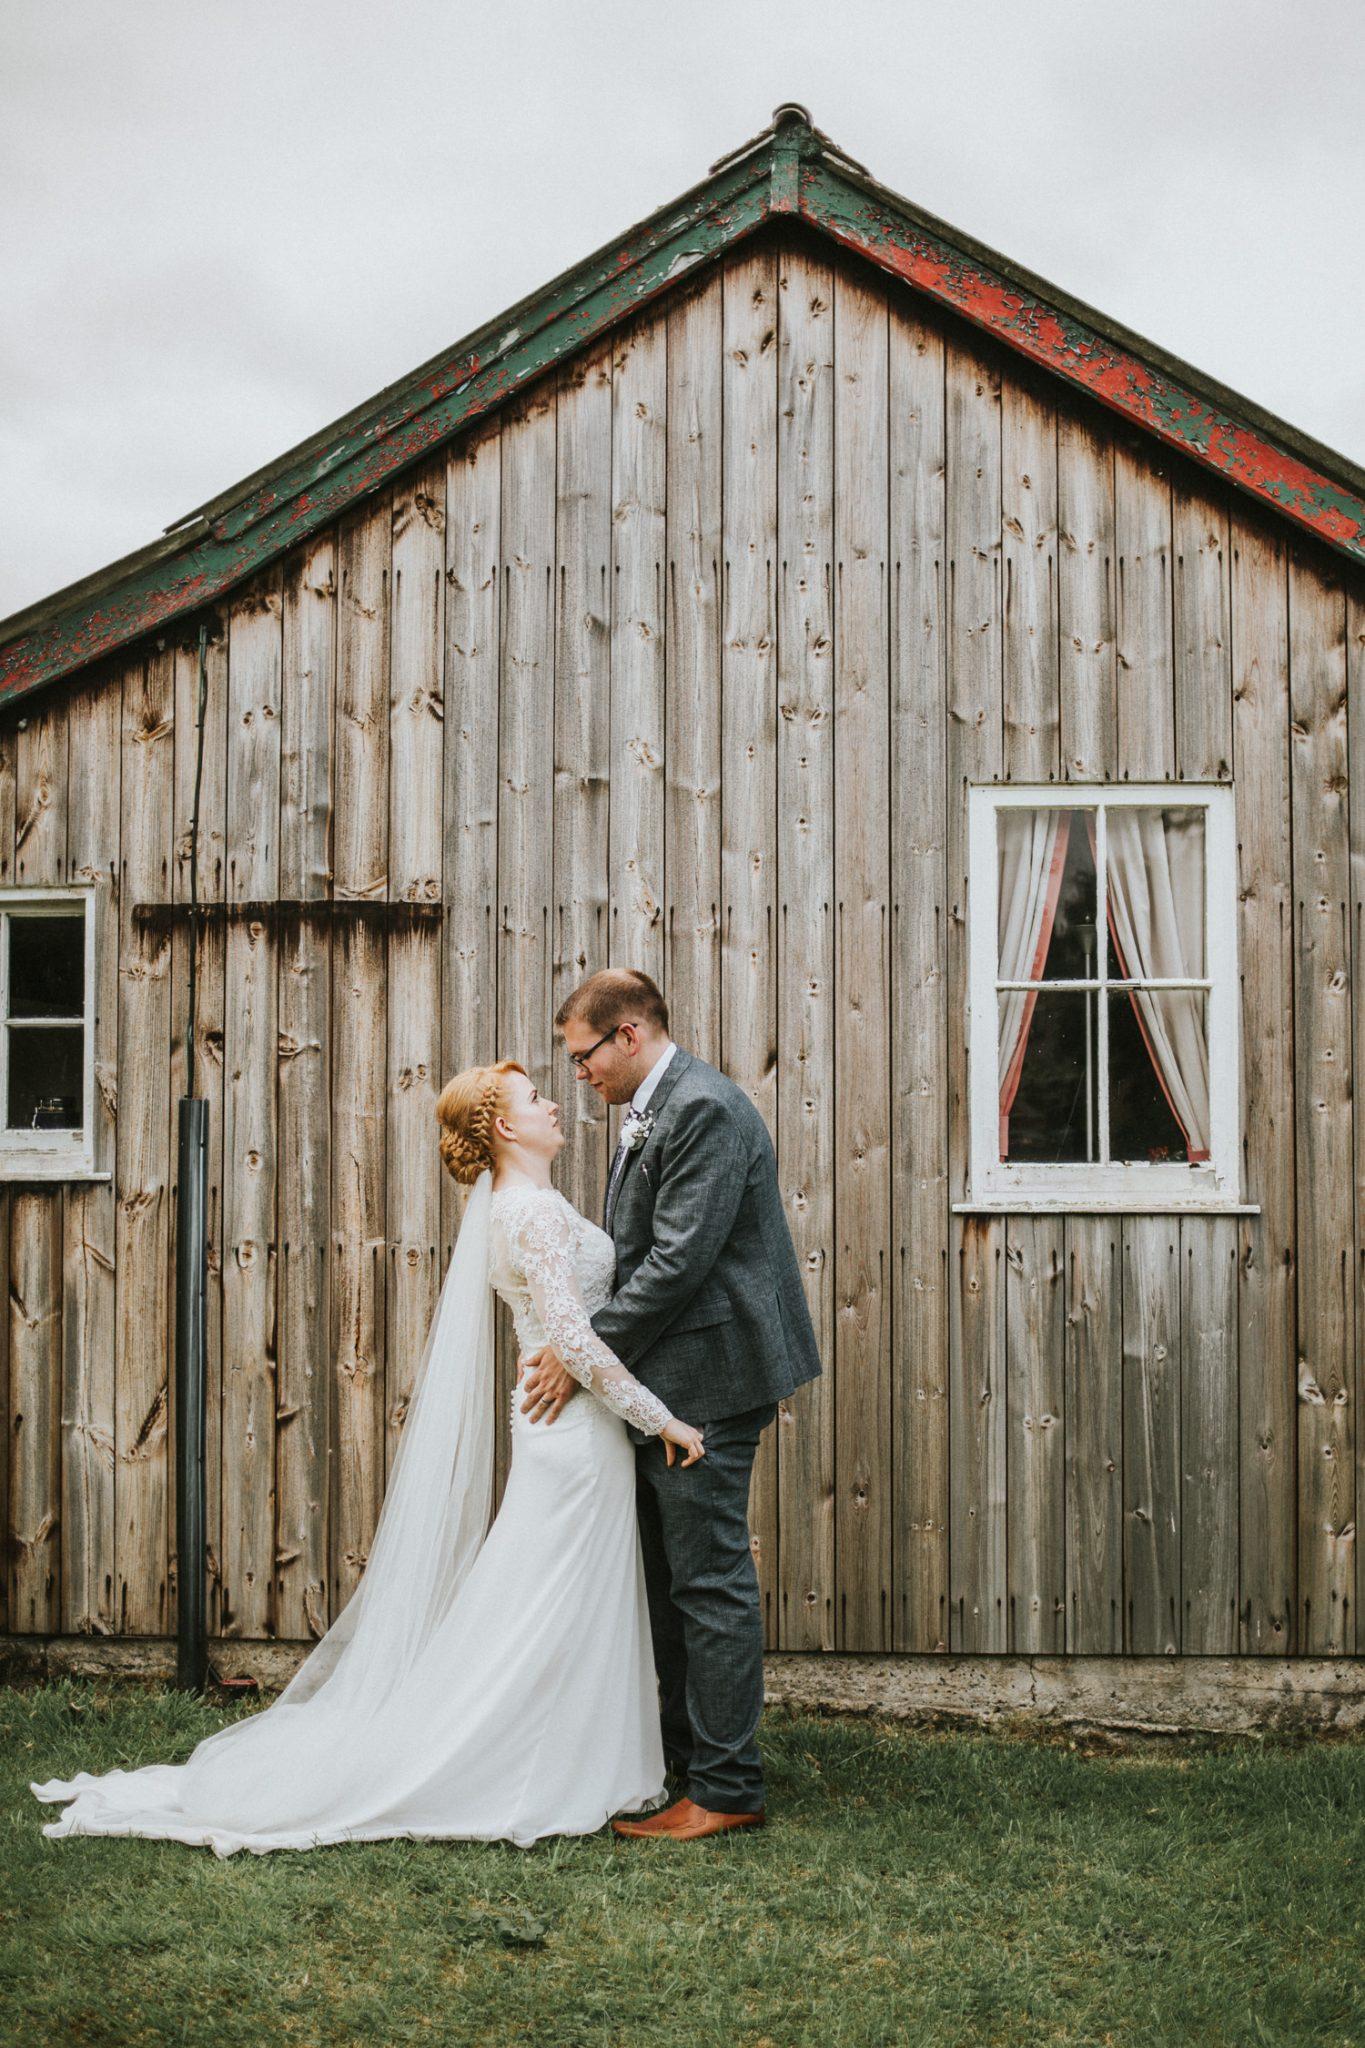 Northumberland Village Hall Wedding - Northumberland Wedding Photographer (7 of 8)